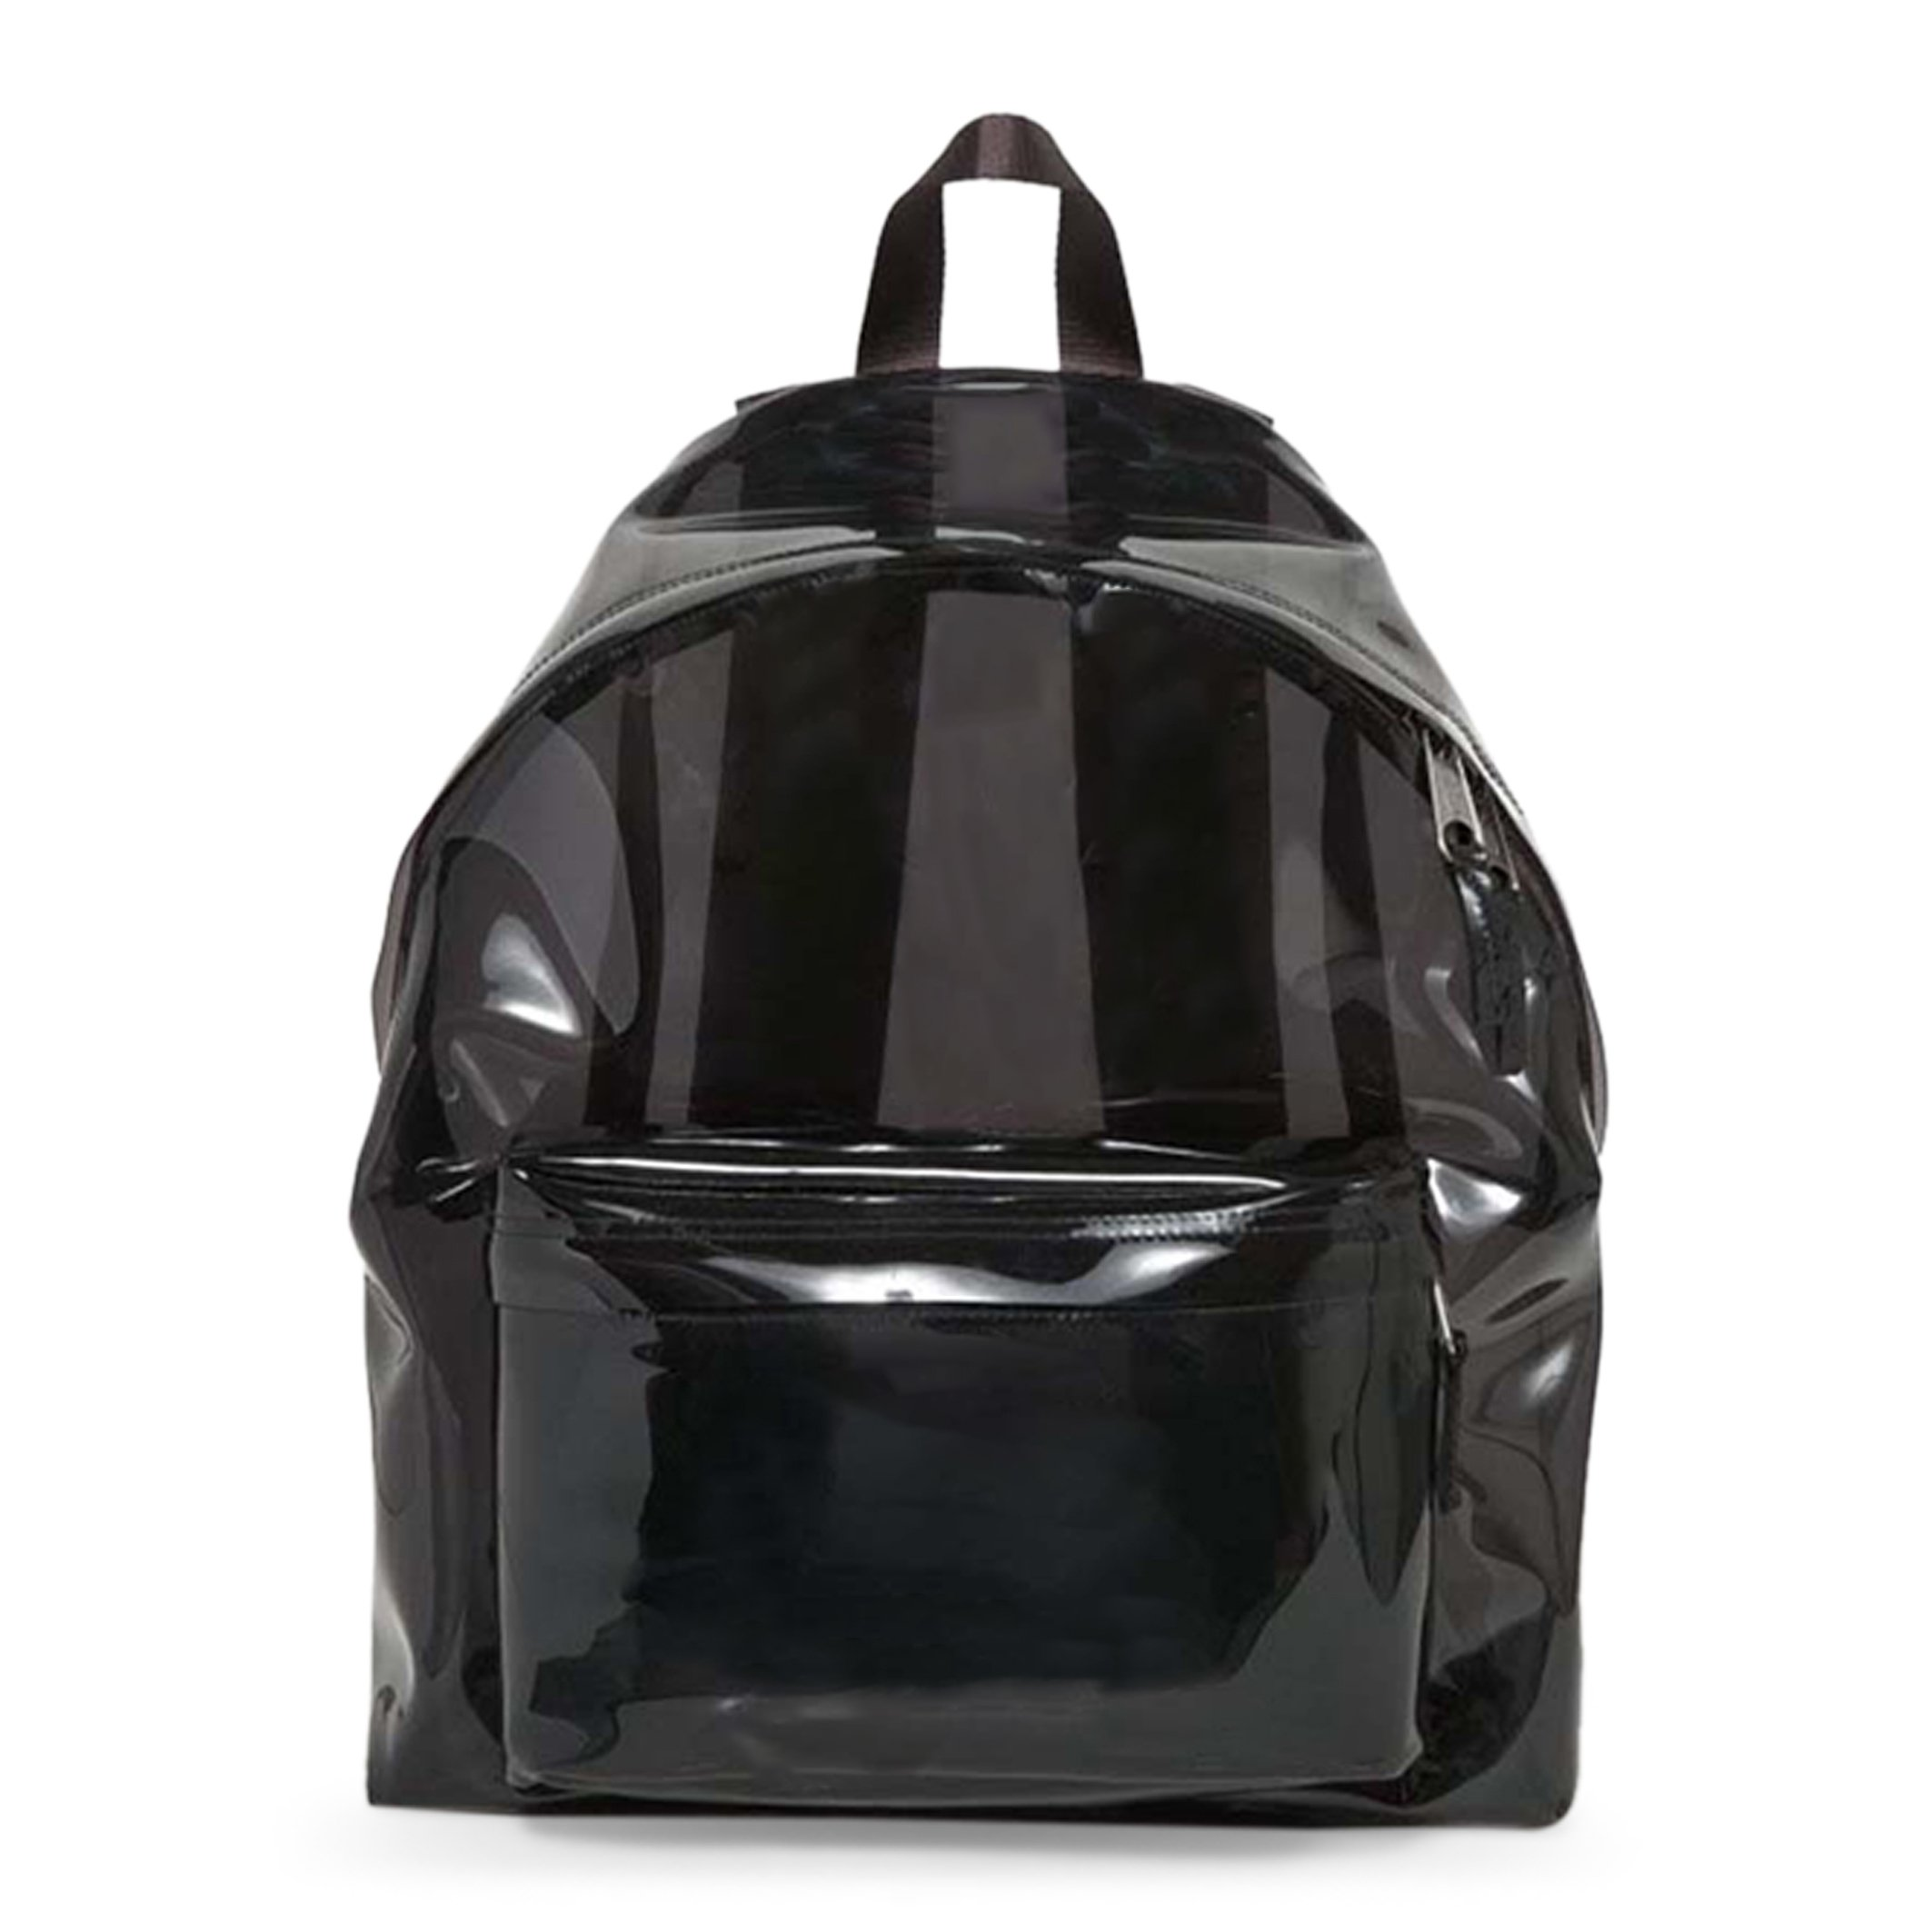 Eastpak Unsiex PADDED-PAKR Backpack Various Colours EK620_C39 - black-2 NOSIZE